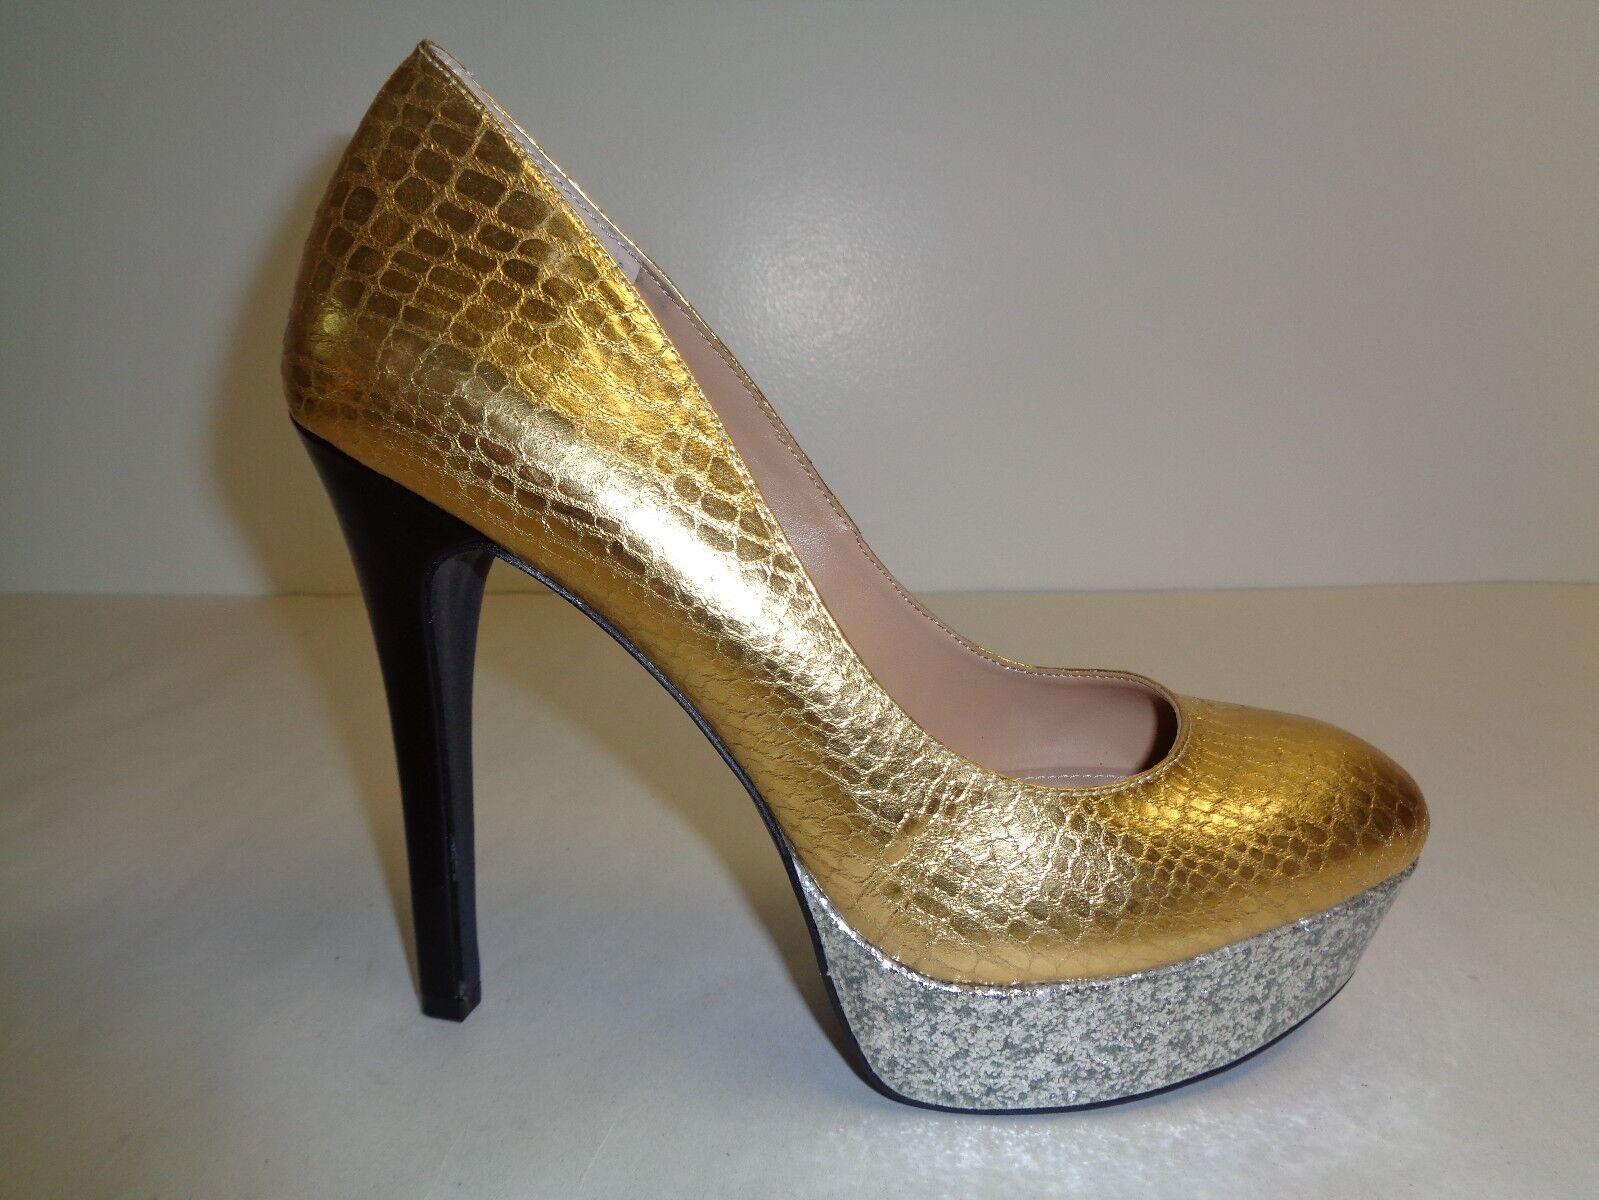 BCBG BCBGeneration Size 7.5 M MASE B Gold Heels Platforms Pumps New Donna Shoes